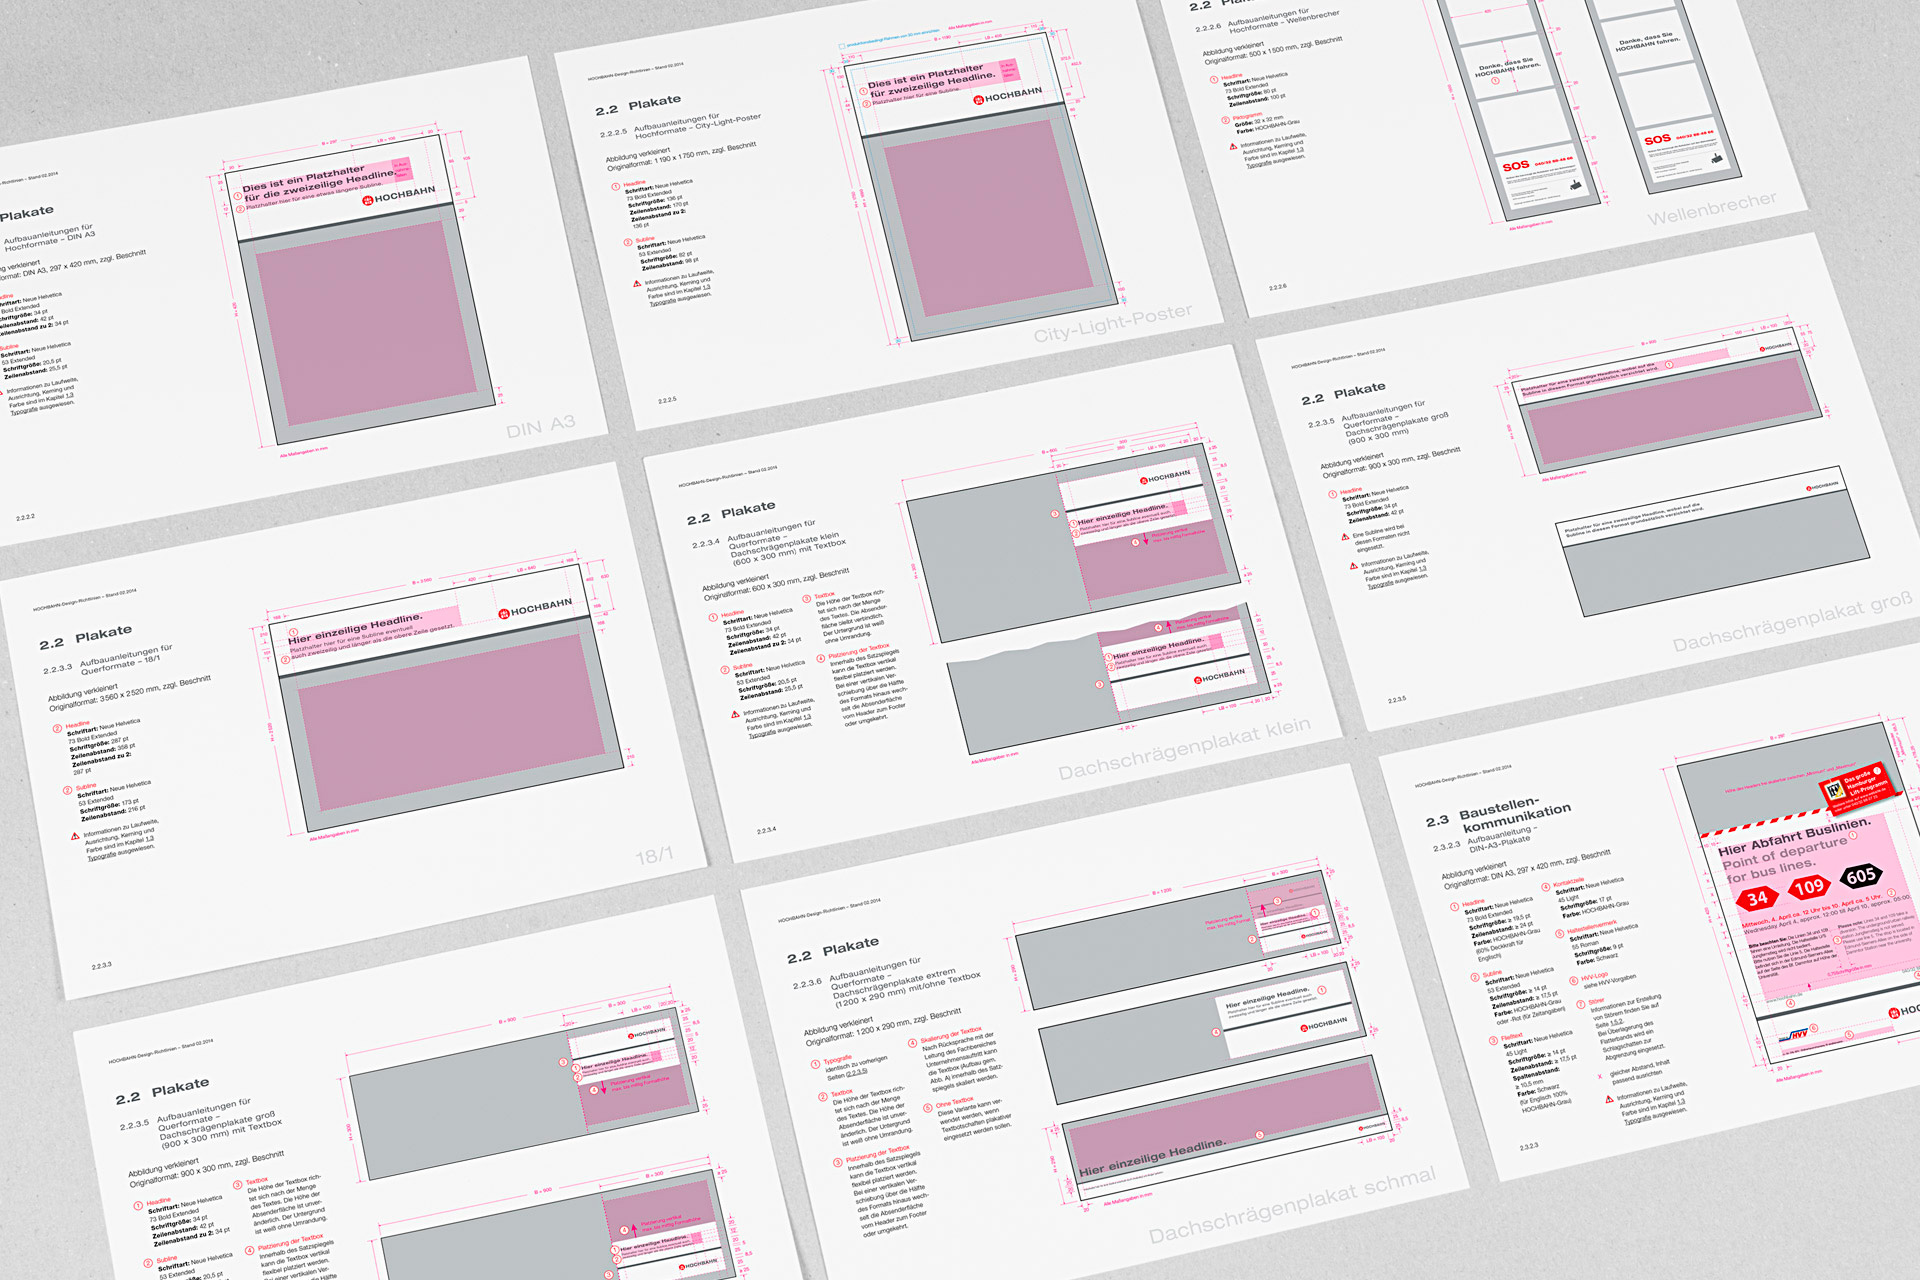 hochbahn-corporate-design manualseiten